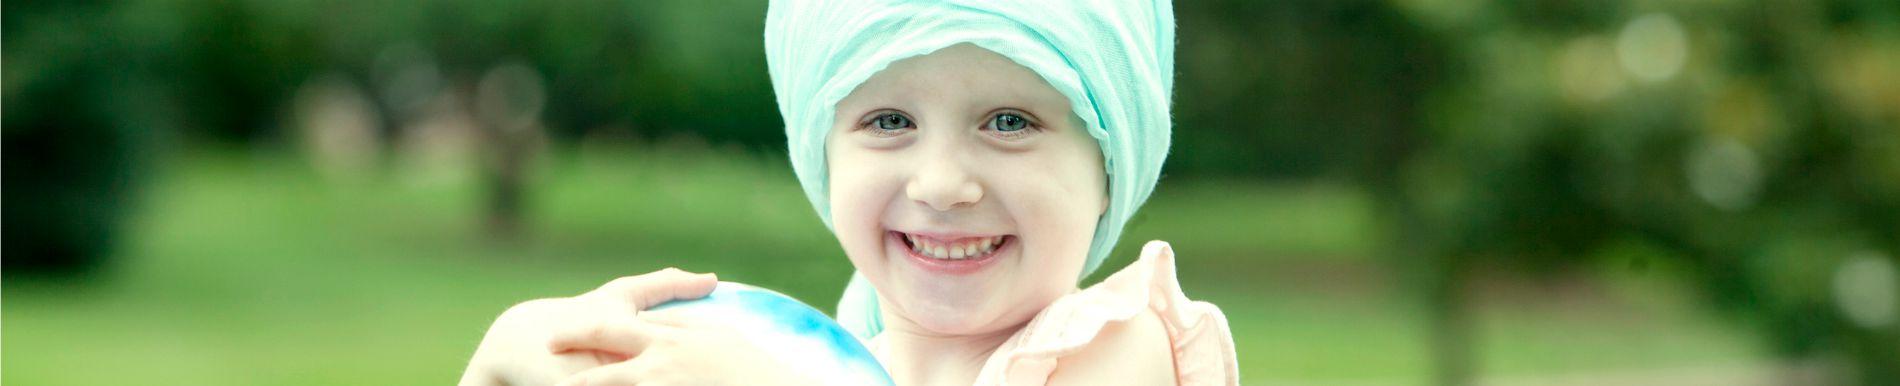 https://www.healthychildren.org/SiteCollectionImage-Homepage-Banners/ChildhoodCancer_girl_banner.jpg